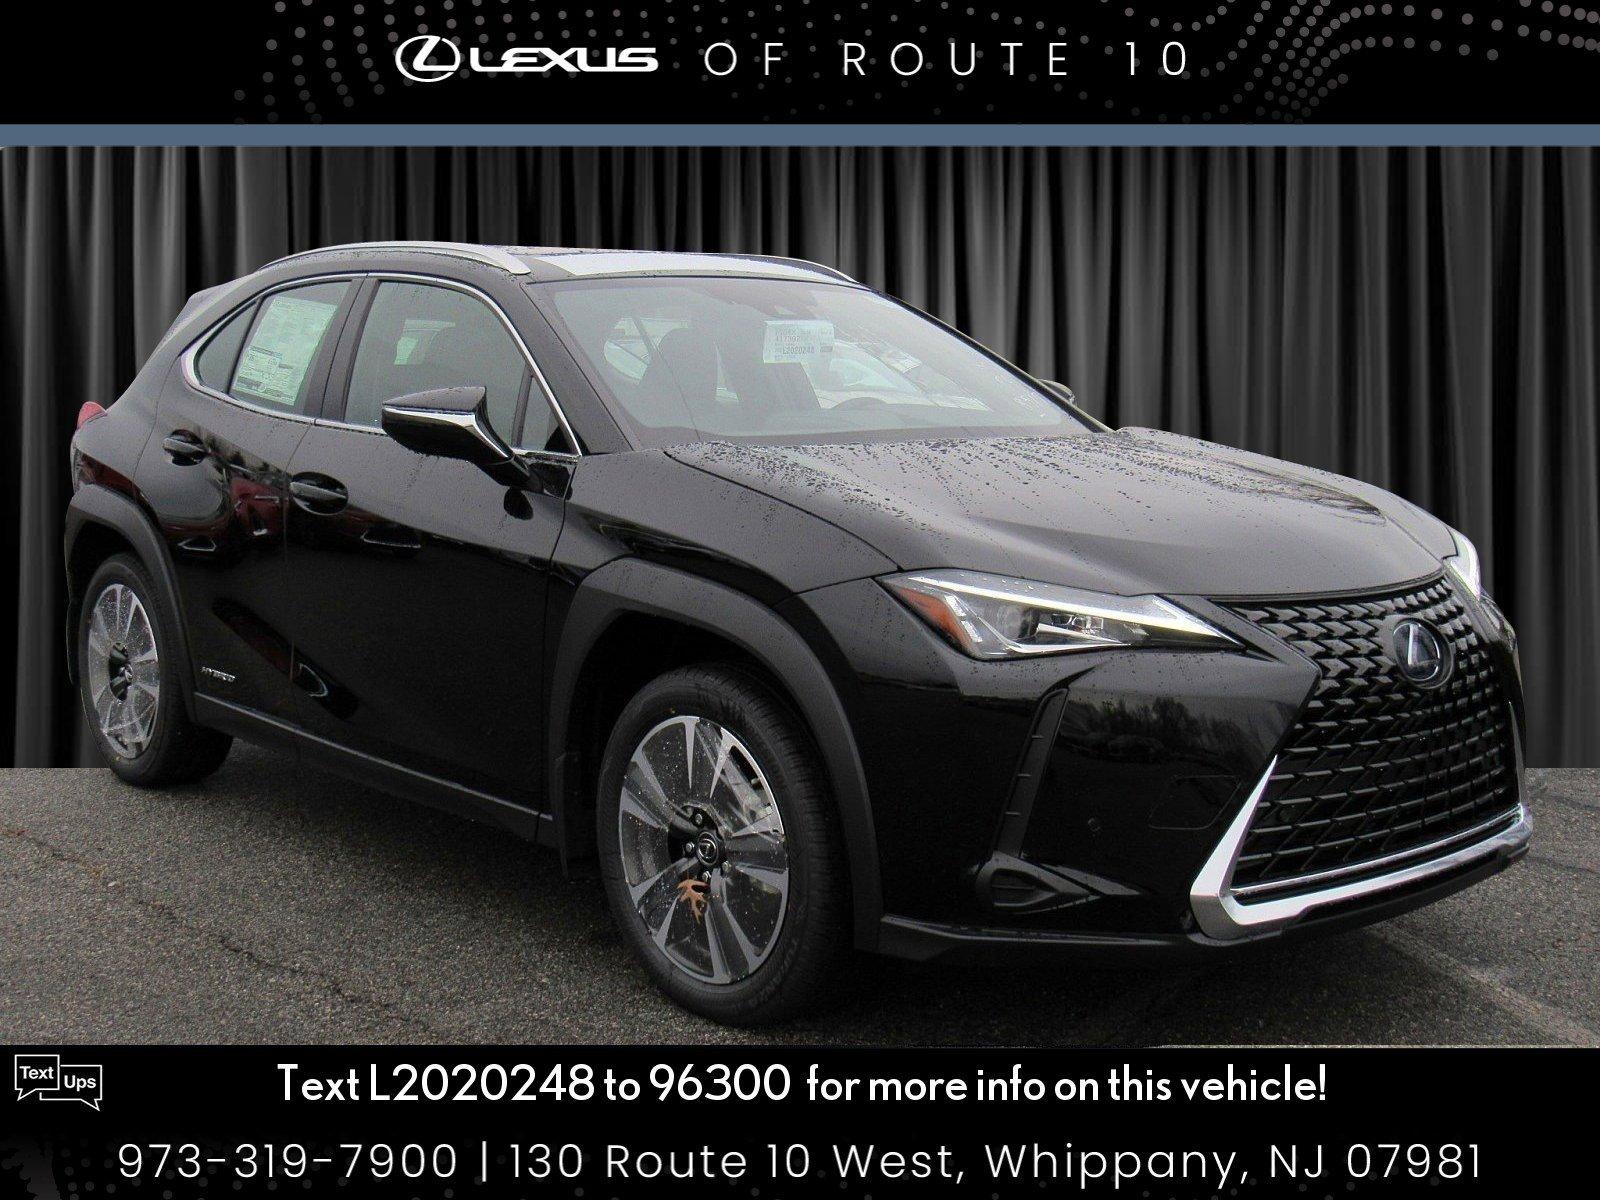 New 2020 Lexus UX UX 250h